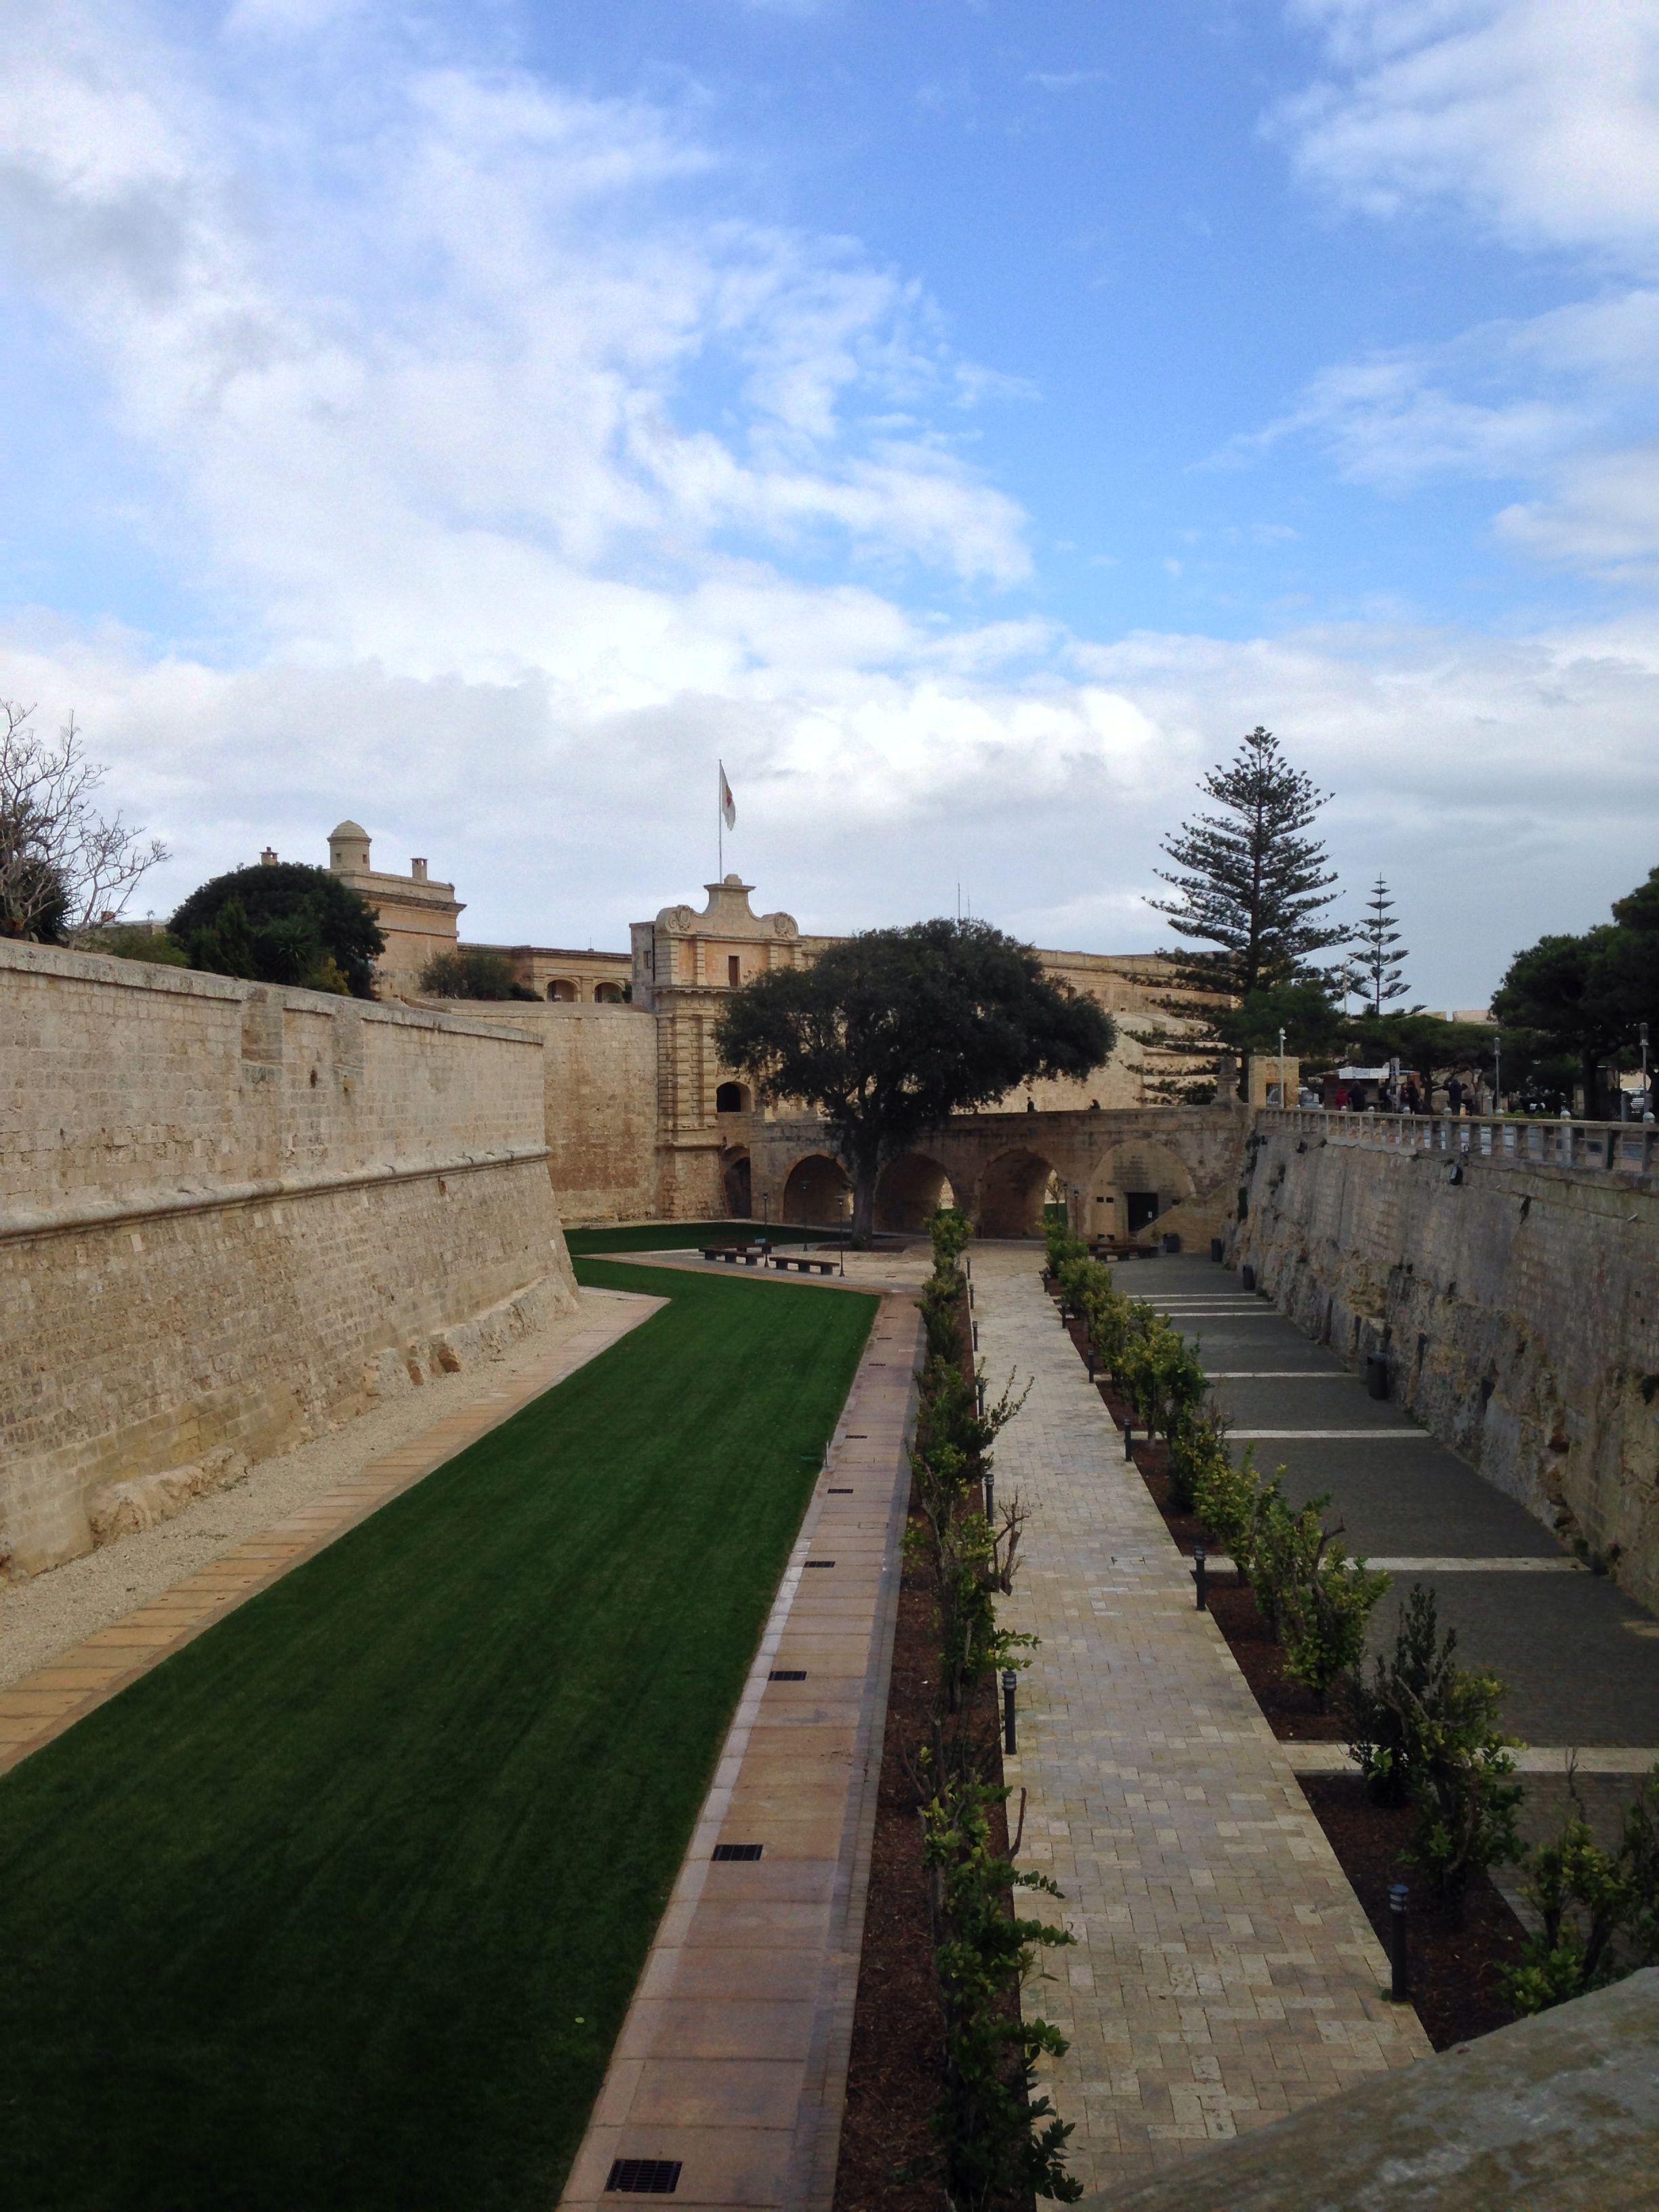 Walking through Medina, Malta